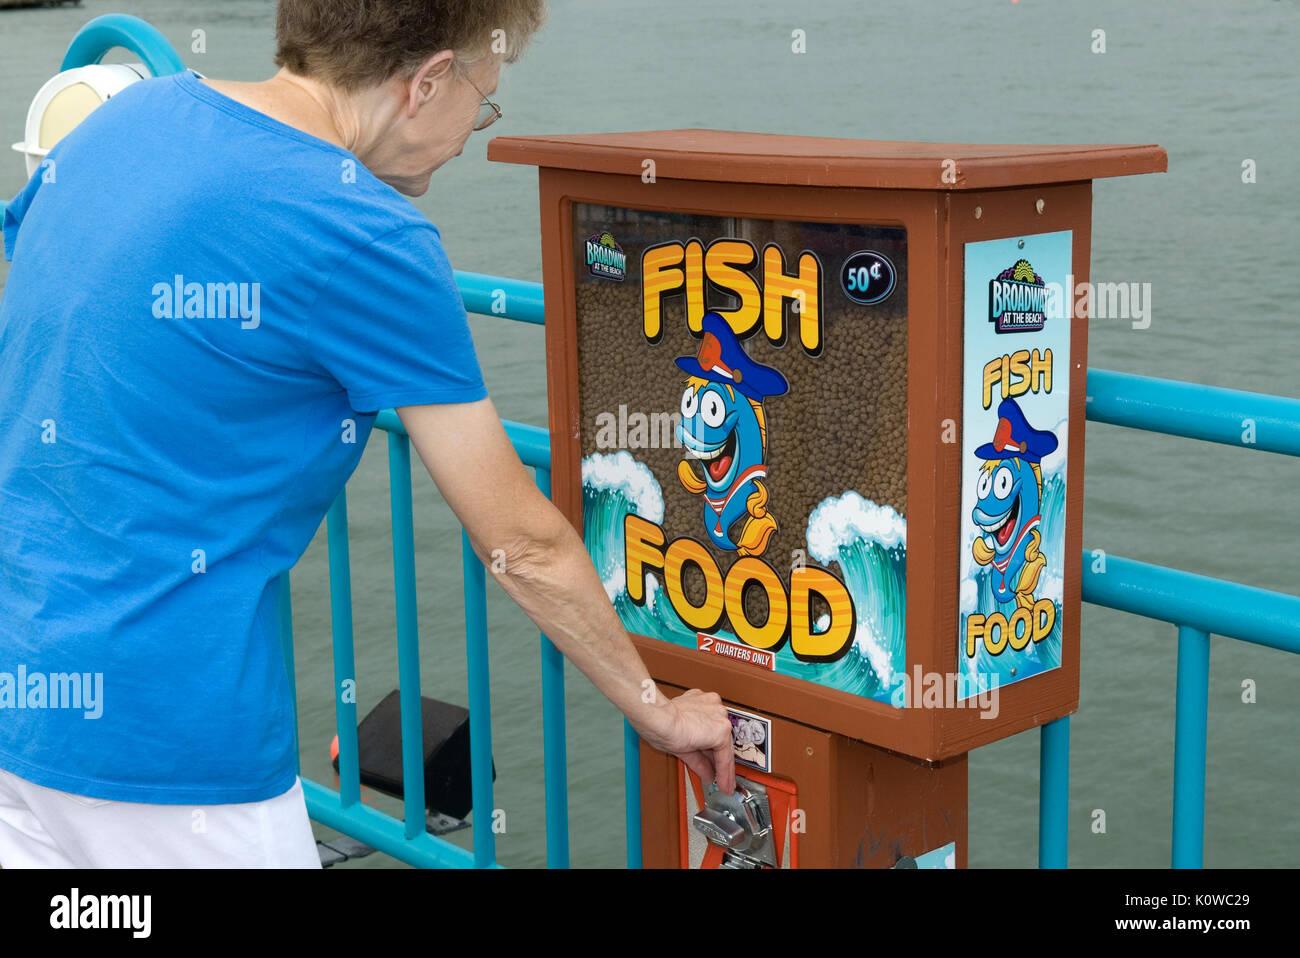 Caucasian Senior Woman Buying Fish Food at Broadway at the Beach, Myrtle Beach South Carolina USA. - Stock Image